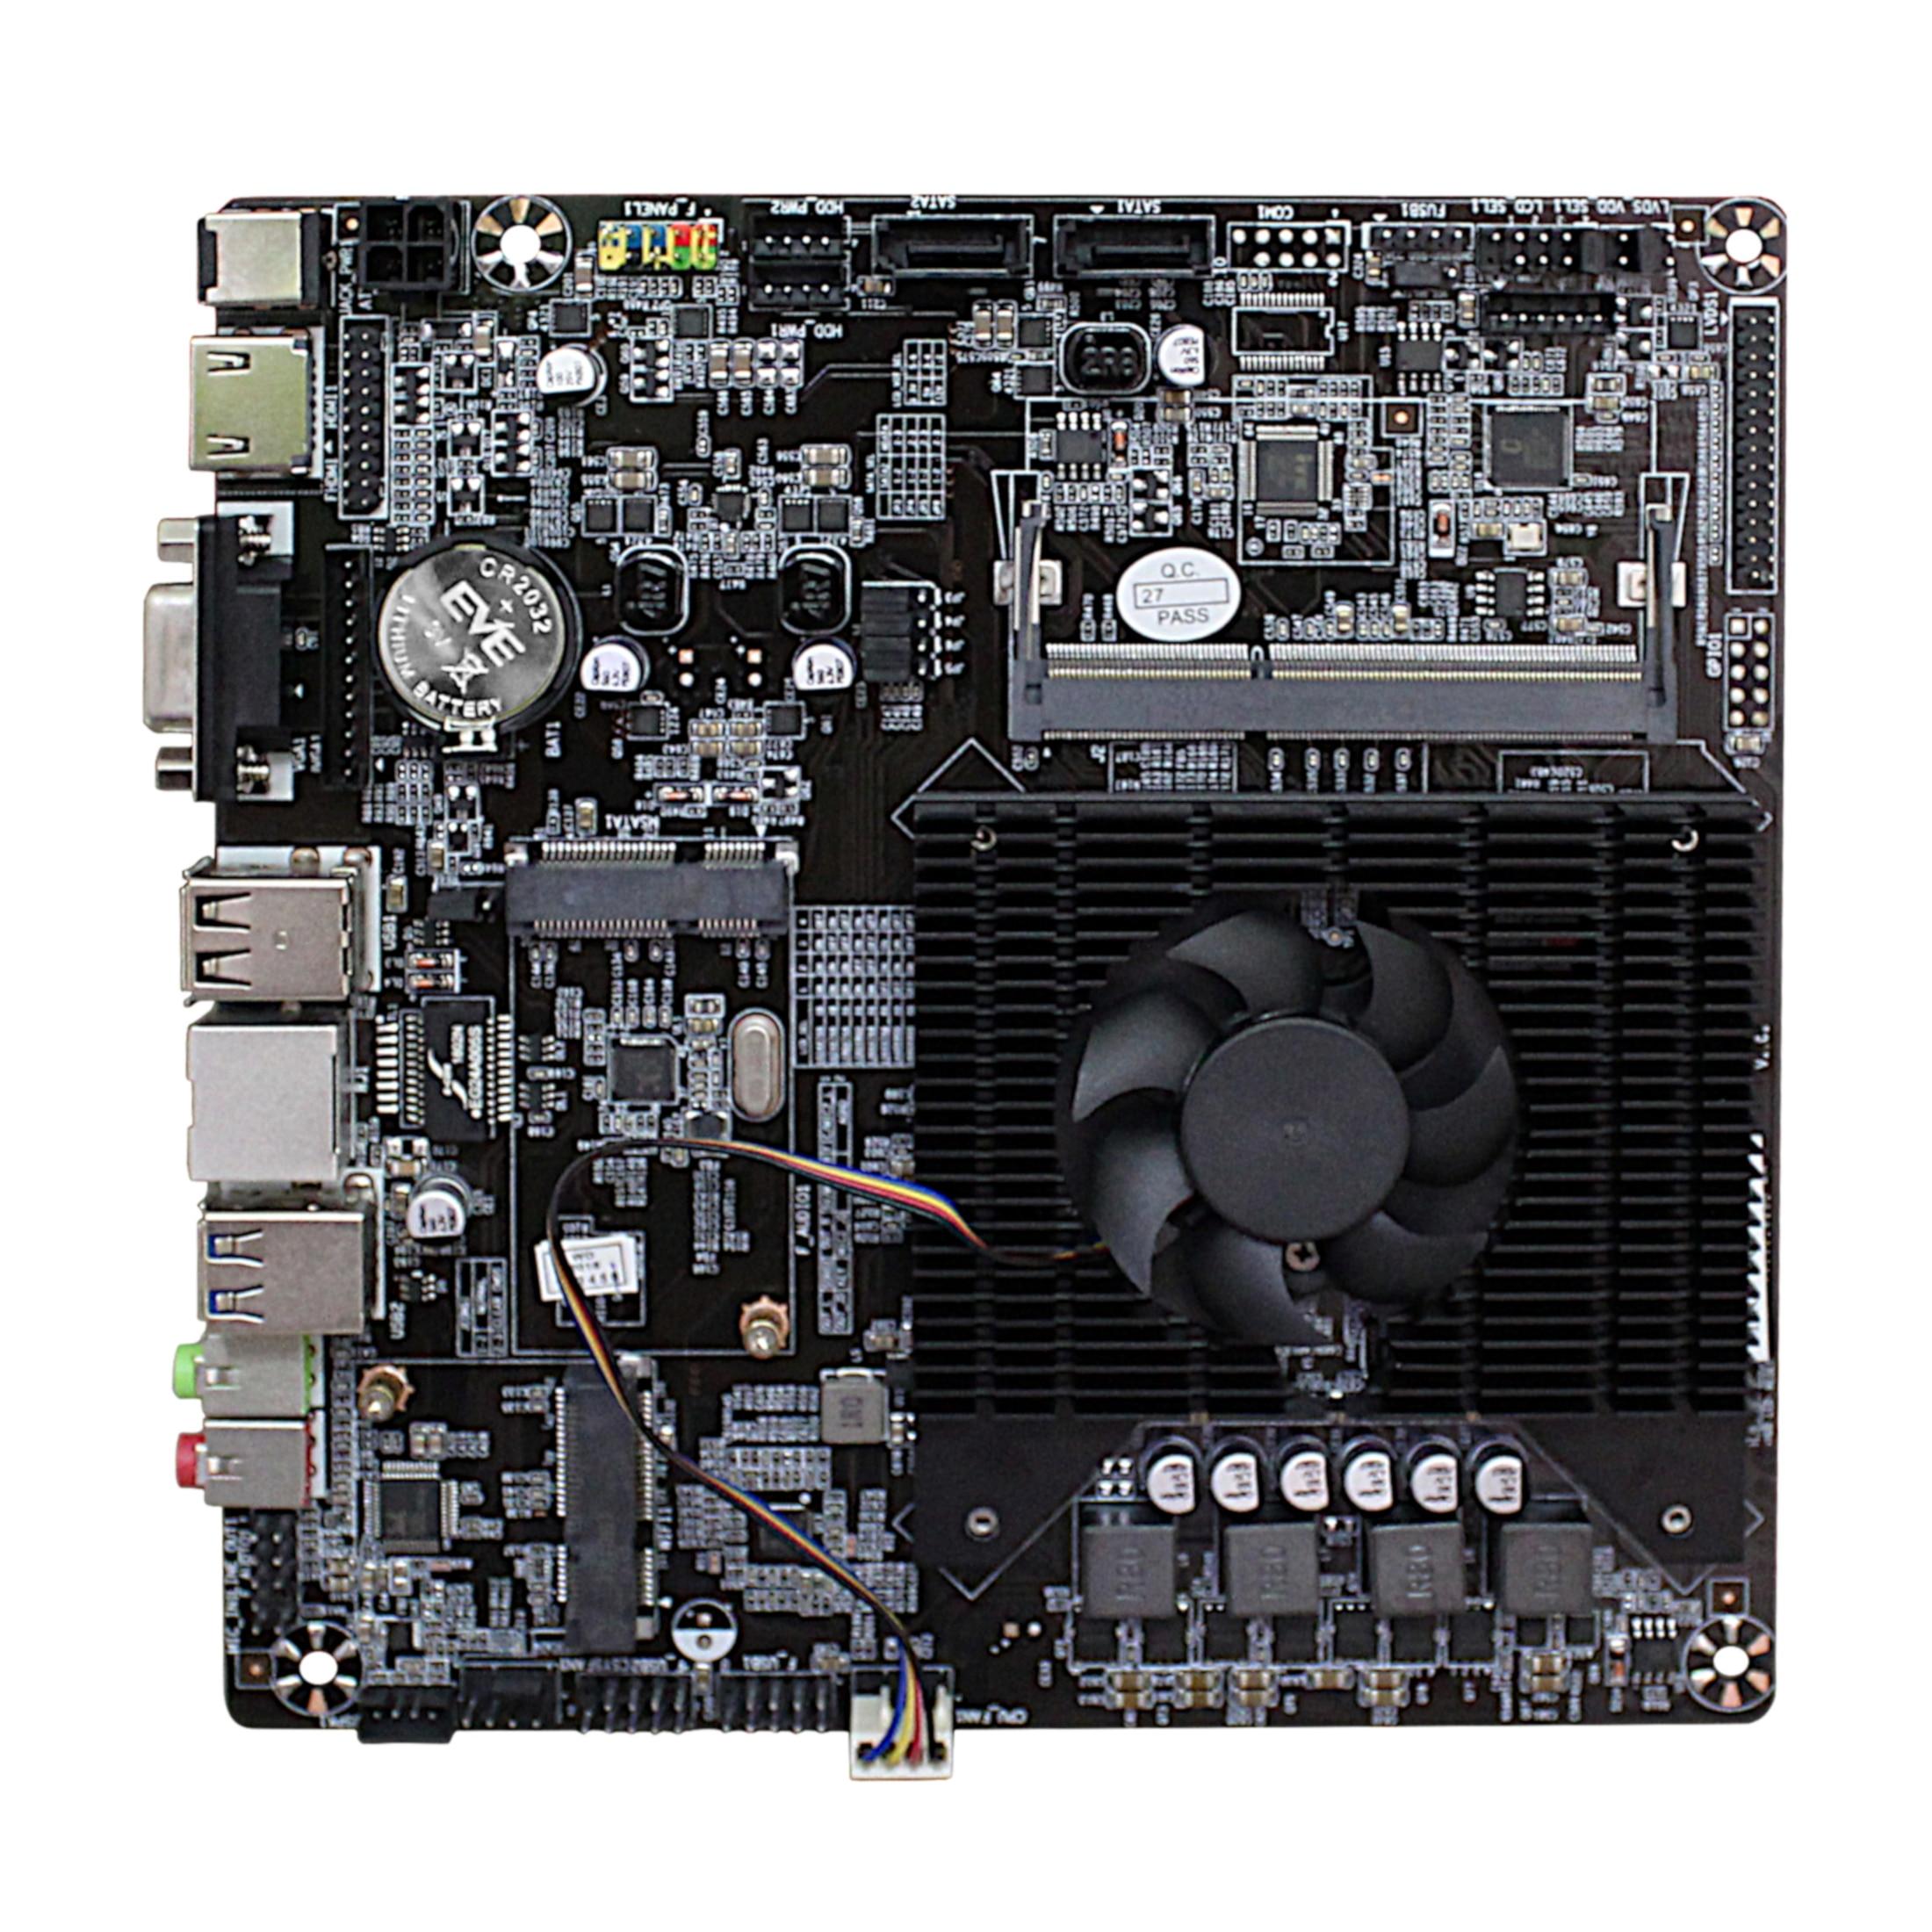 Ultra-thin Mini itx Motherboard Built in  CPU A8 6410  R5 Video Graph Processing APU USB 3.0 VGA RJ45 HDMI USB mSata Use 12V DC